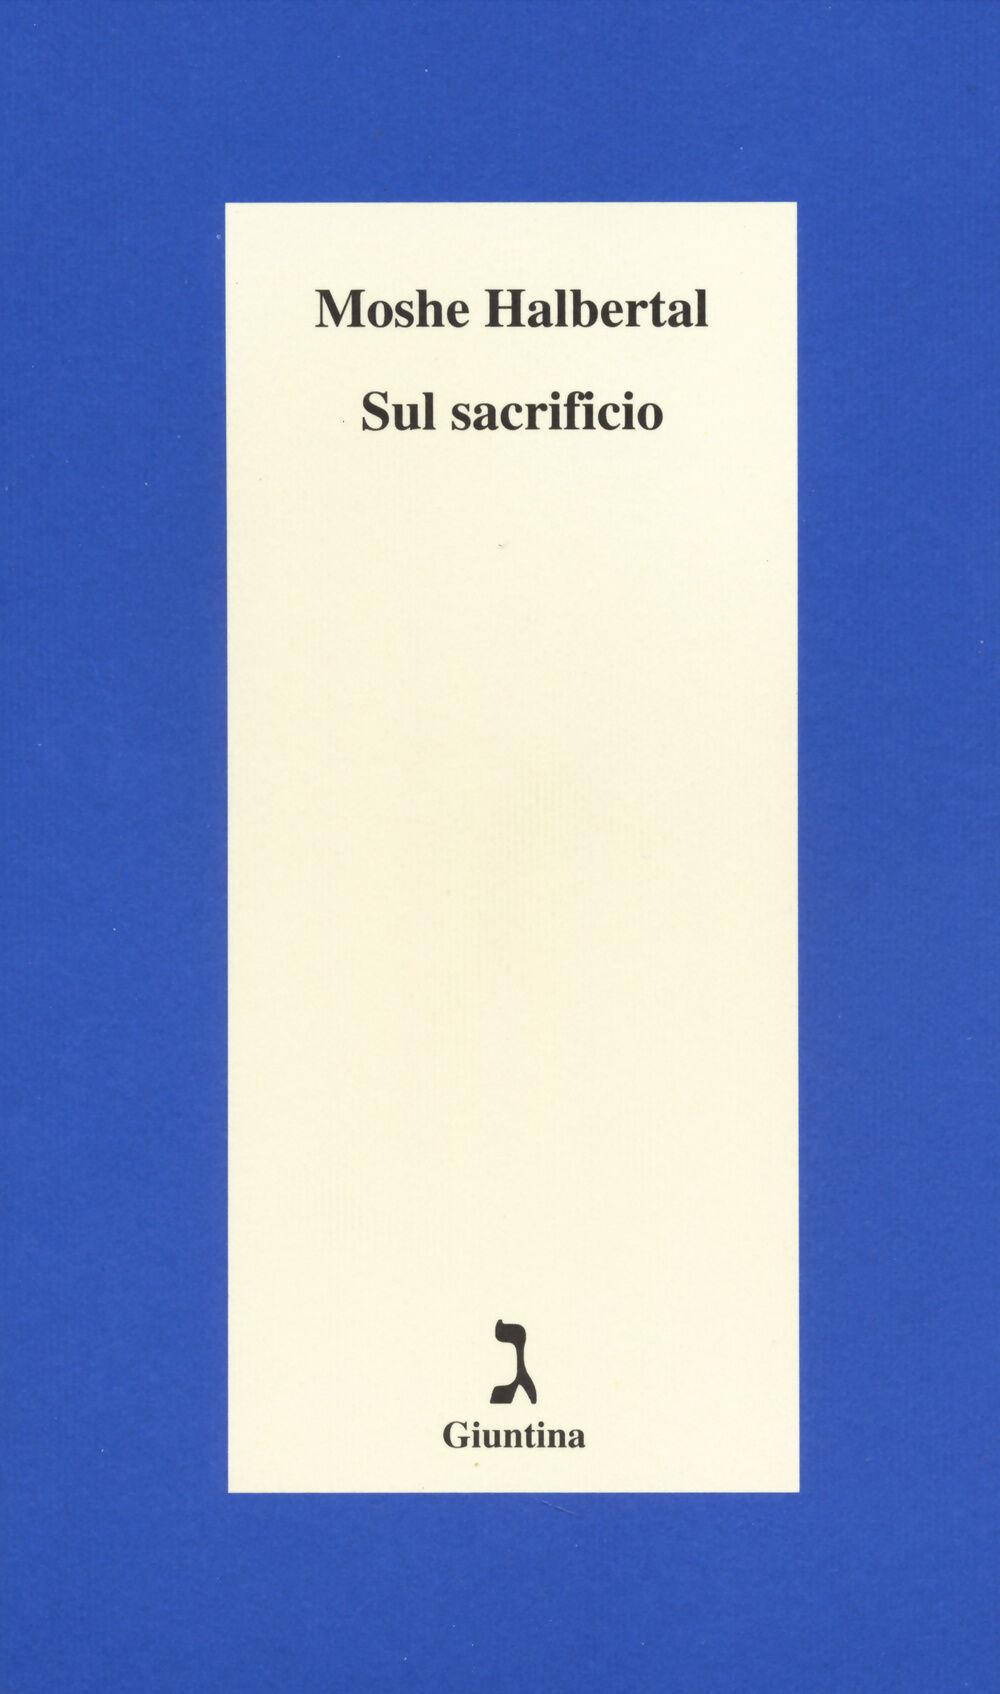 Sul sacrificio